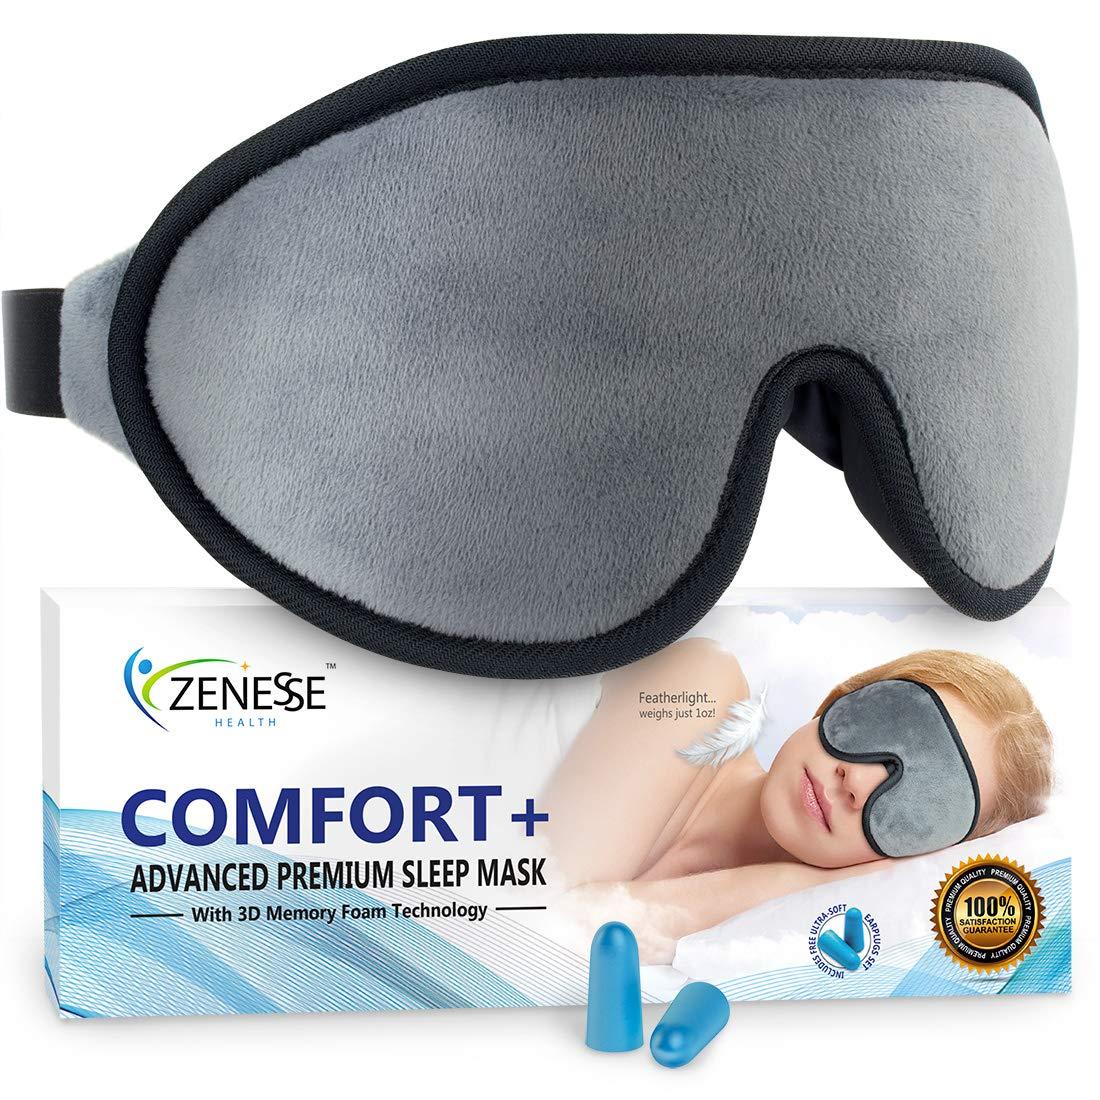 Comfort+ Advanced Premium Sleep Mask for Women & Men | Superior 3D REM Sleep Cavities Blacks Out All Light - 1oz Featherlight Eye Mask for Sleeping Won't Irritate Nose, Hair or Eyelash Extensions